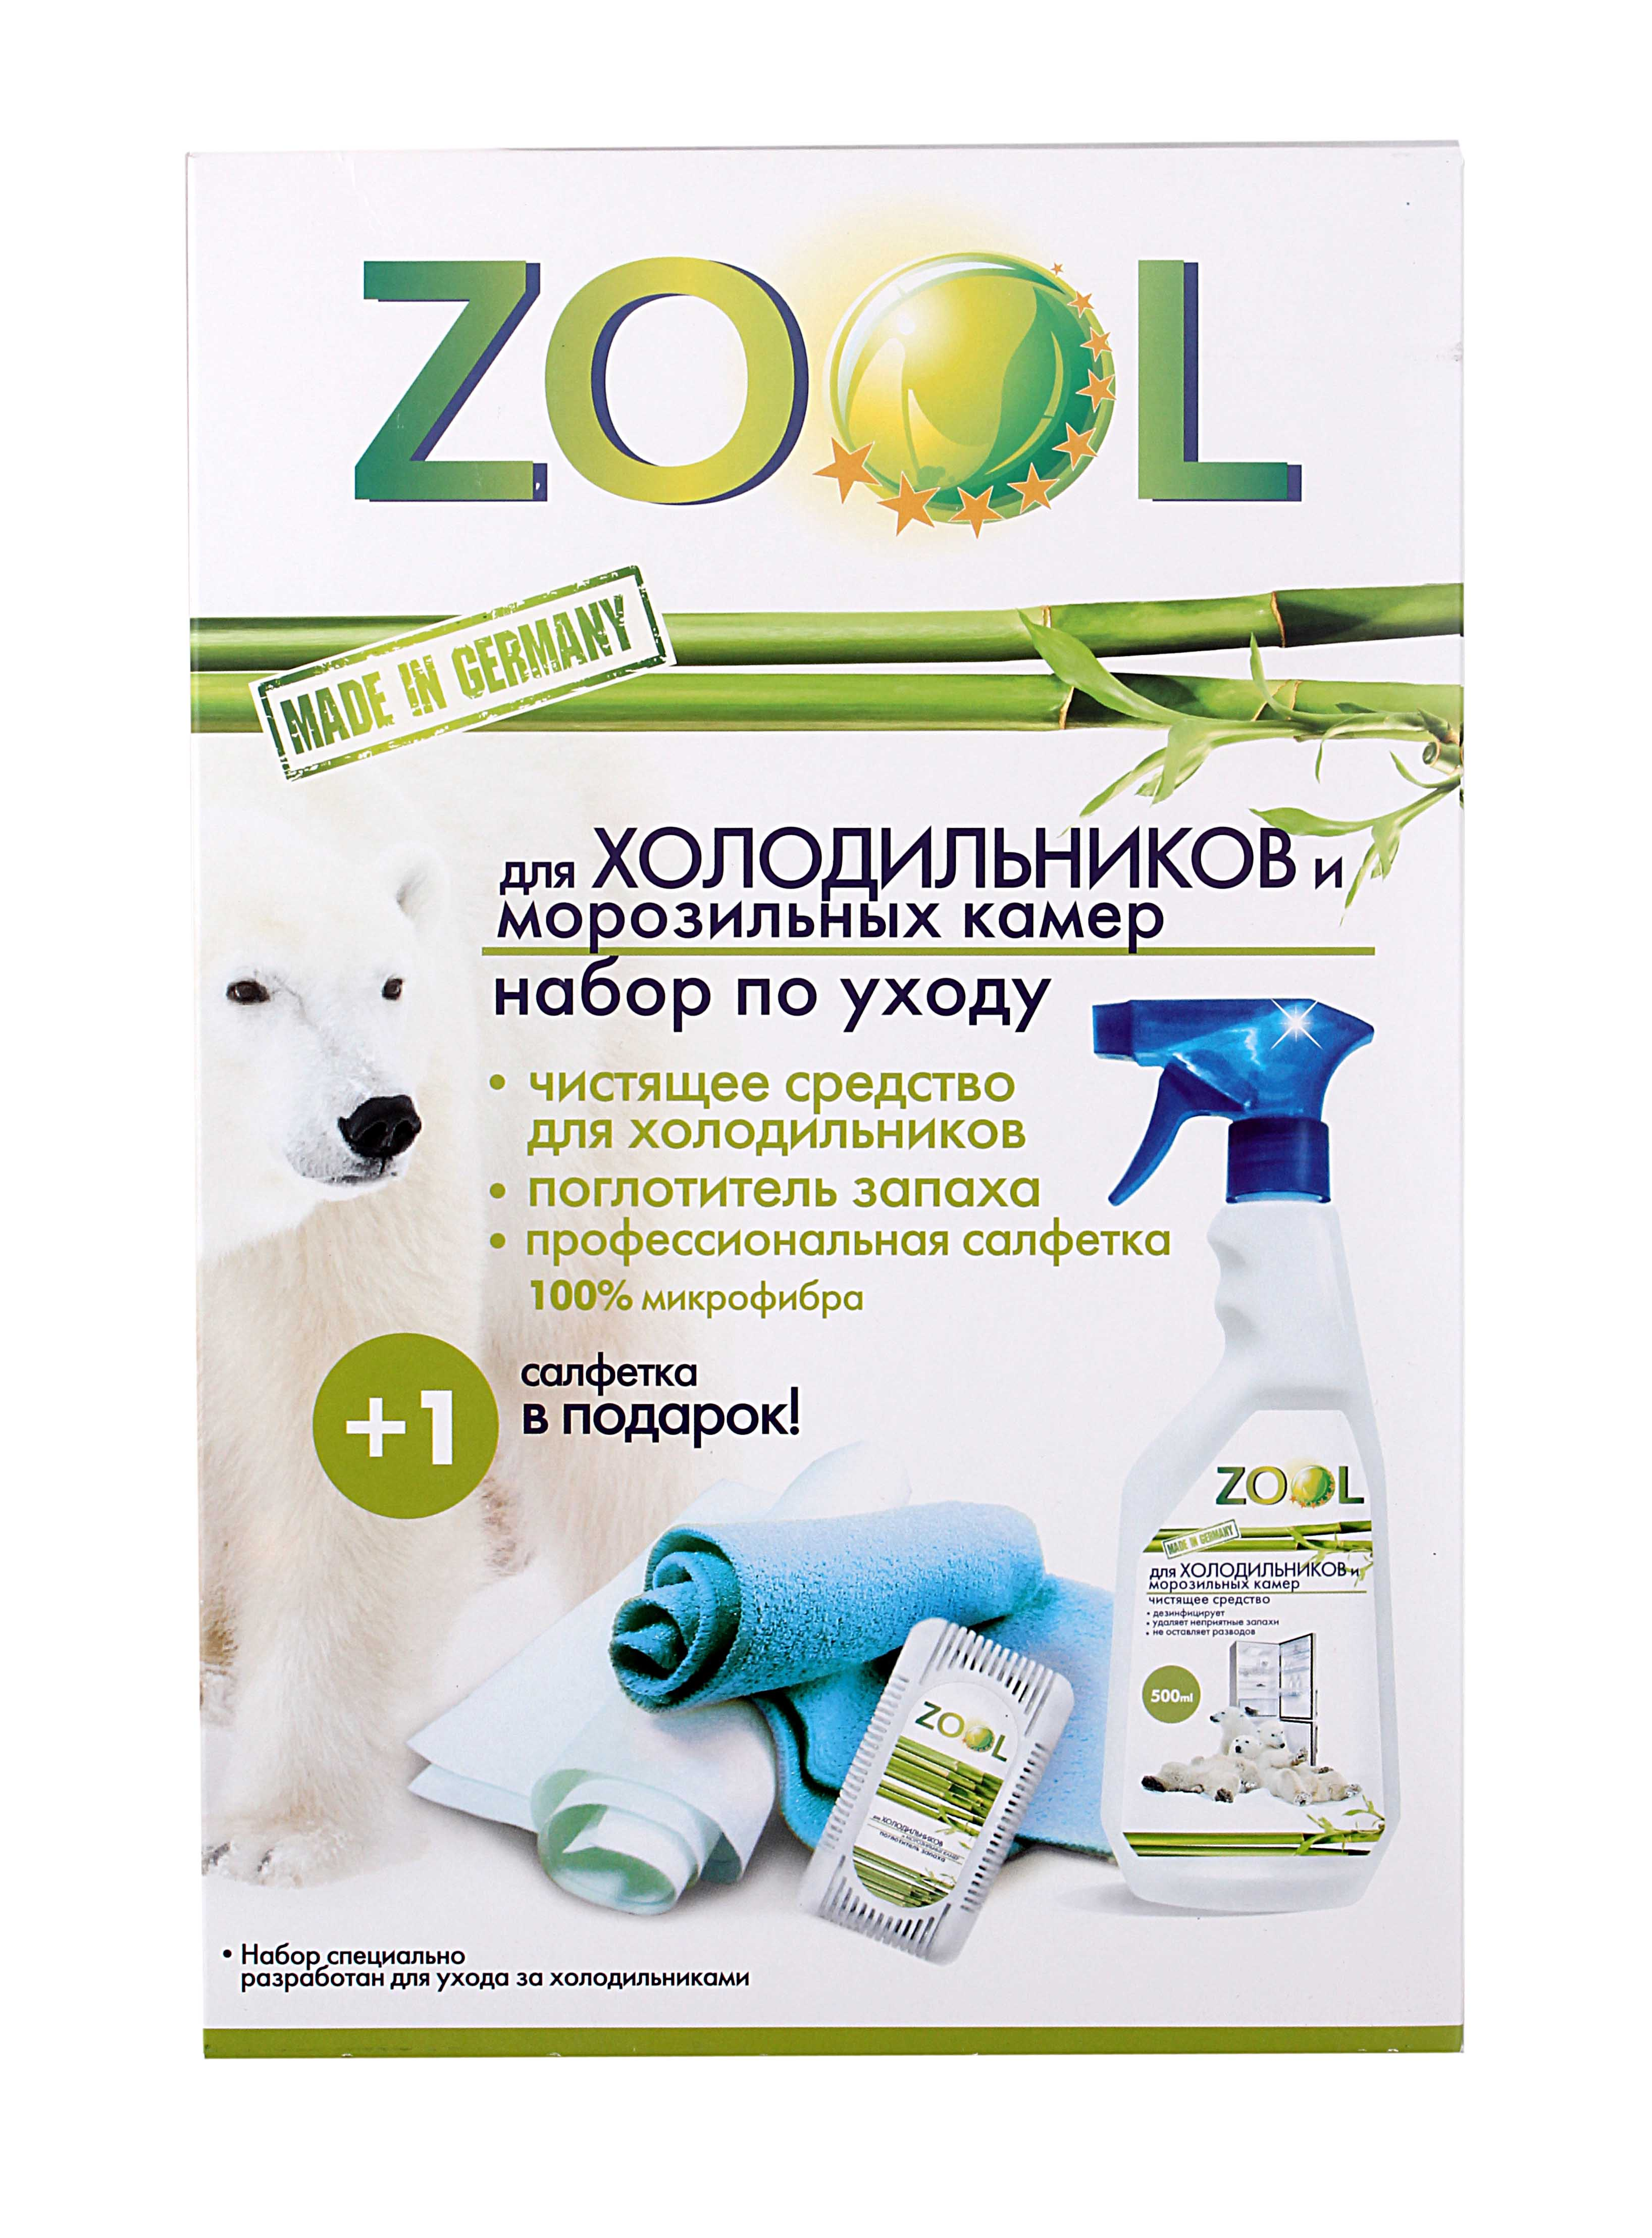 Аксессуар к холодильникам Zool